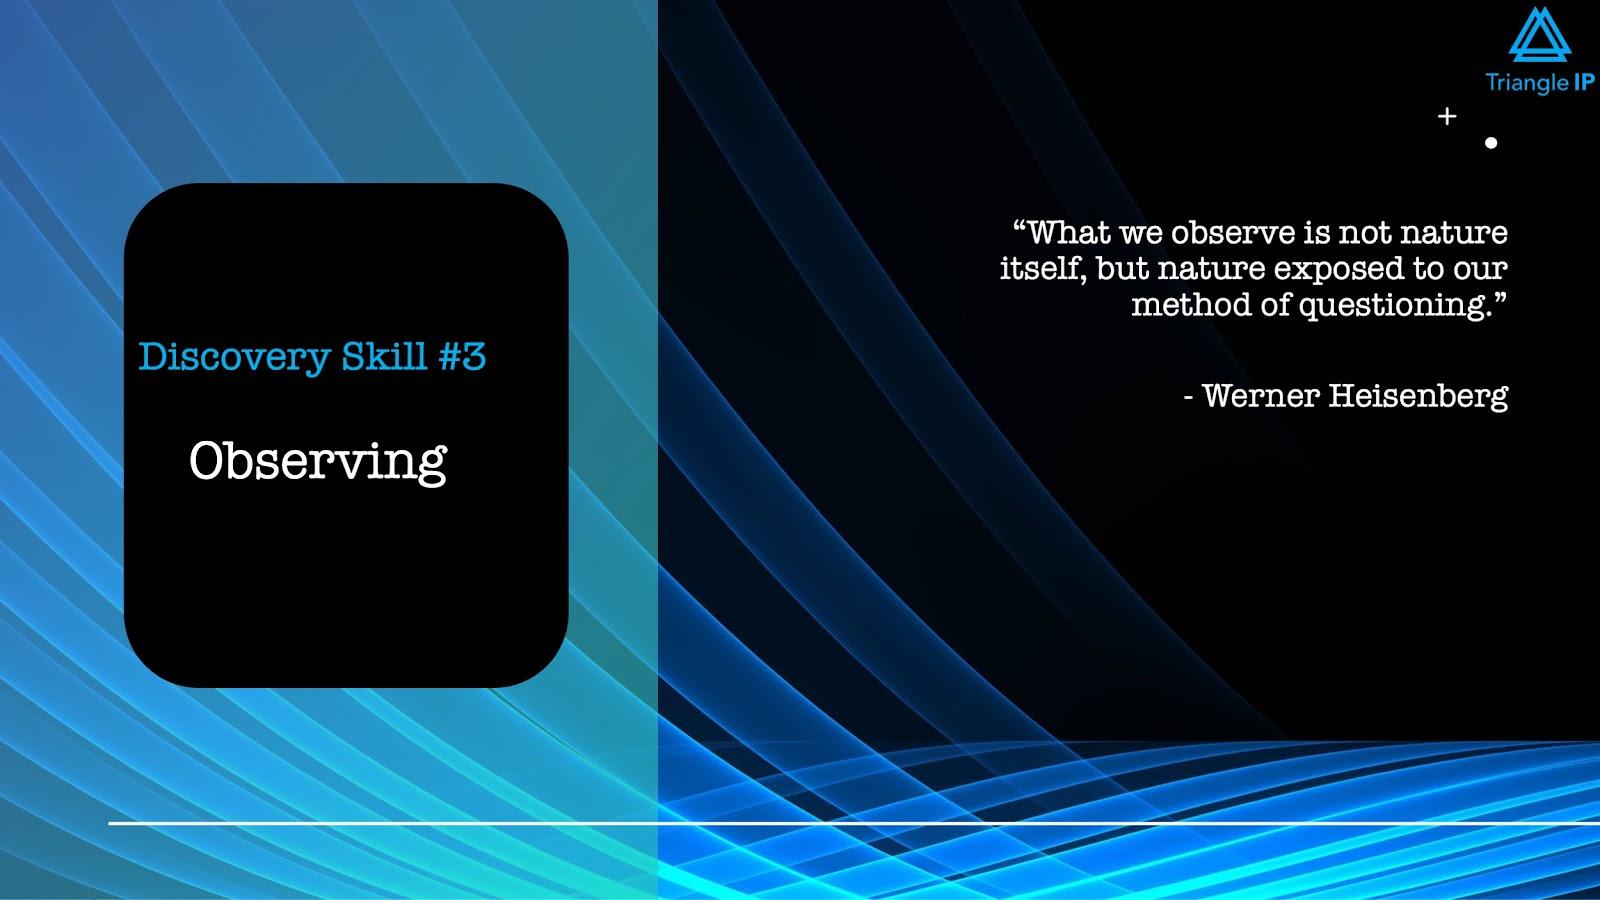 Disruptive Innovators | Discovery Skill #3 Observing